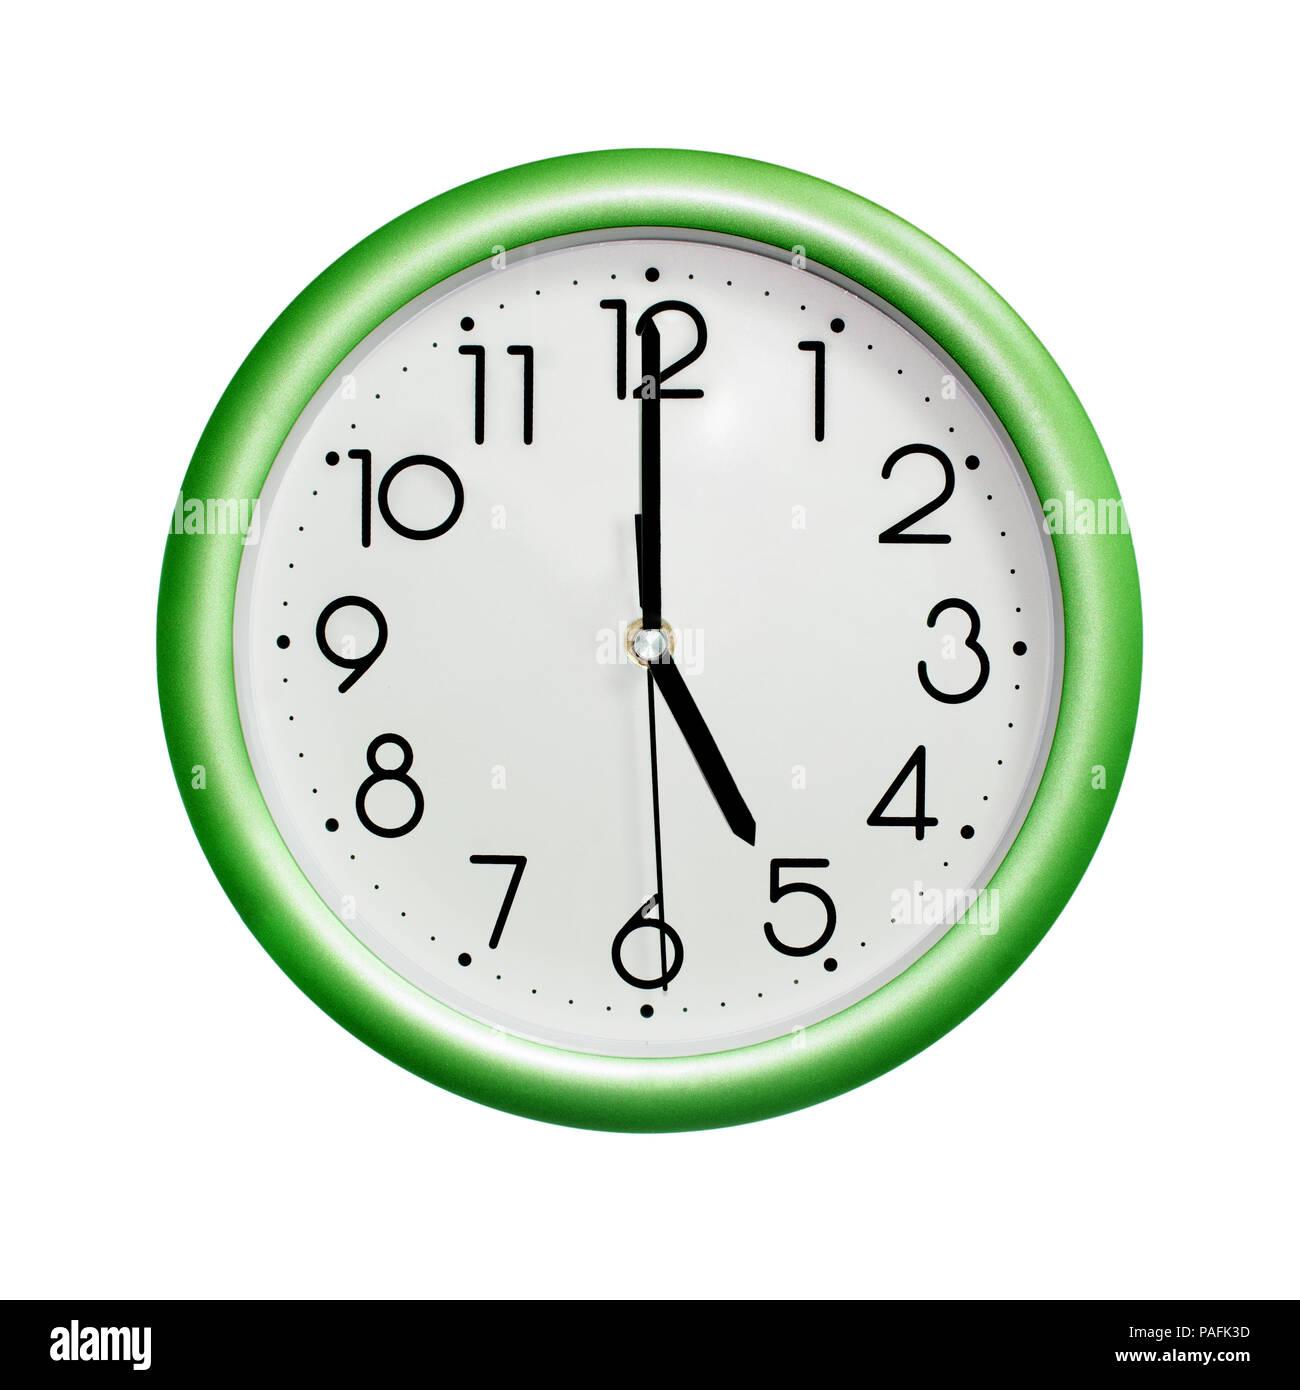 5 heures cercle photo horloge murale vert sur fond blanc. Black Bedroom Furniture Sets. Home Design Ideas